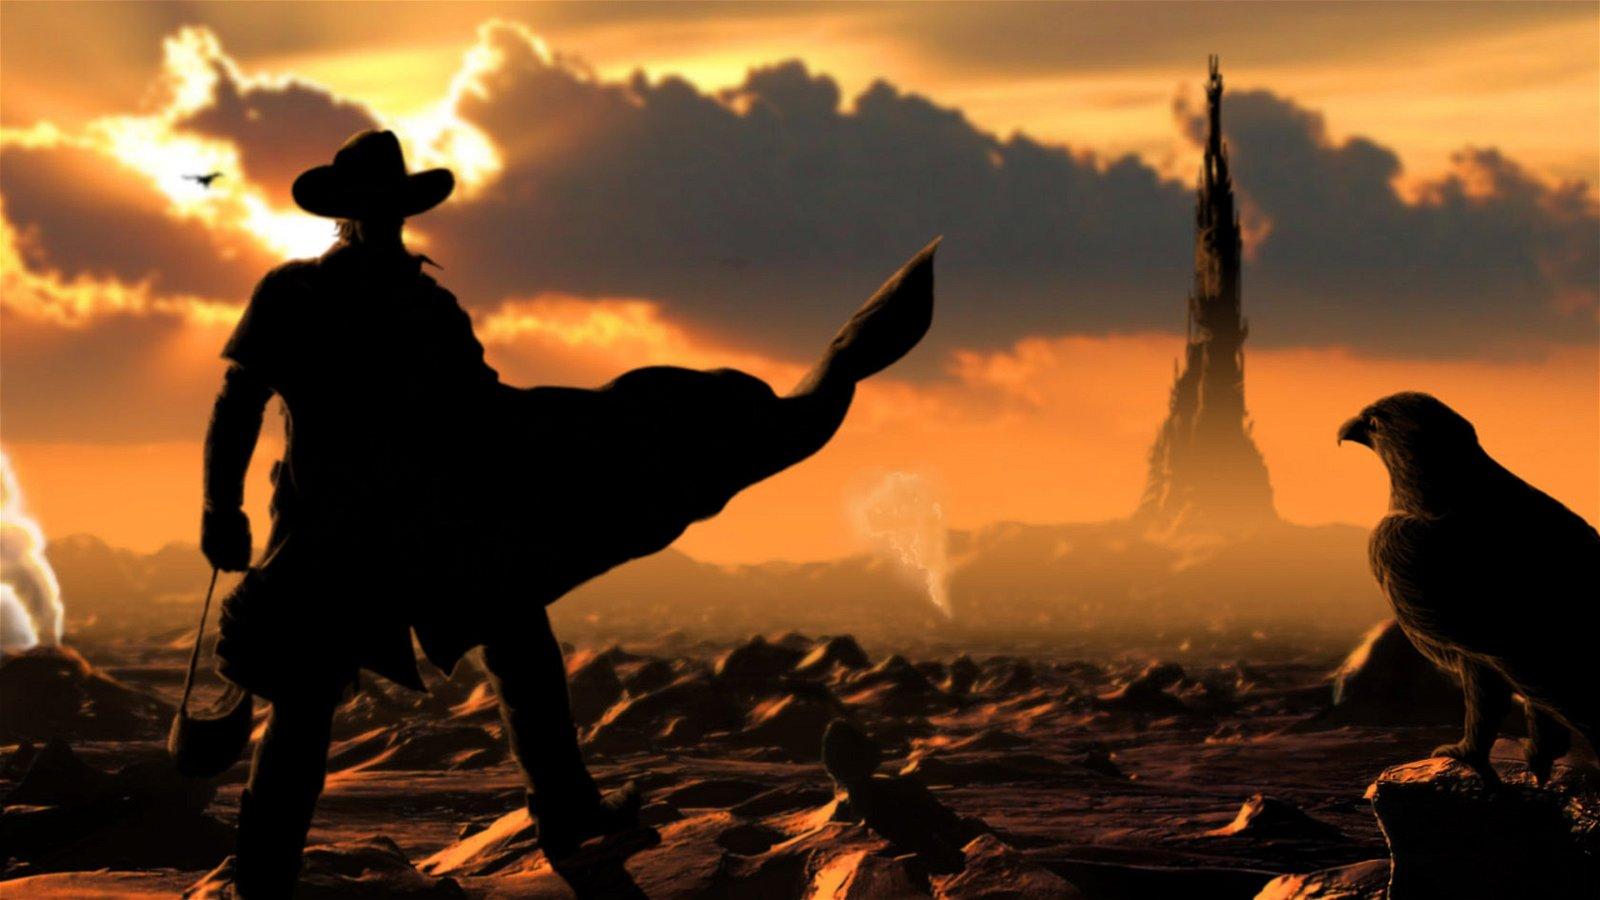 First On-Set Images Of Idris Elba As The Gunslinger Revealed 4